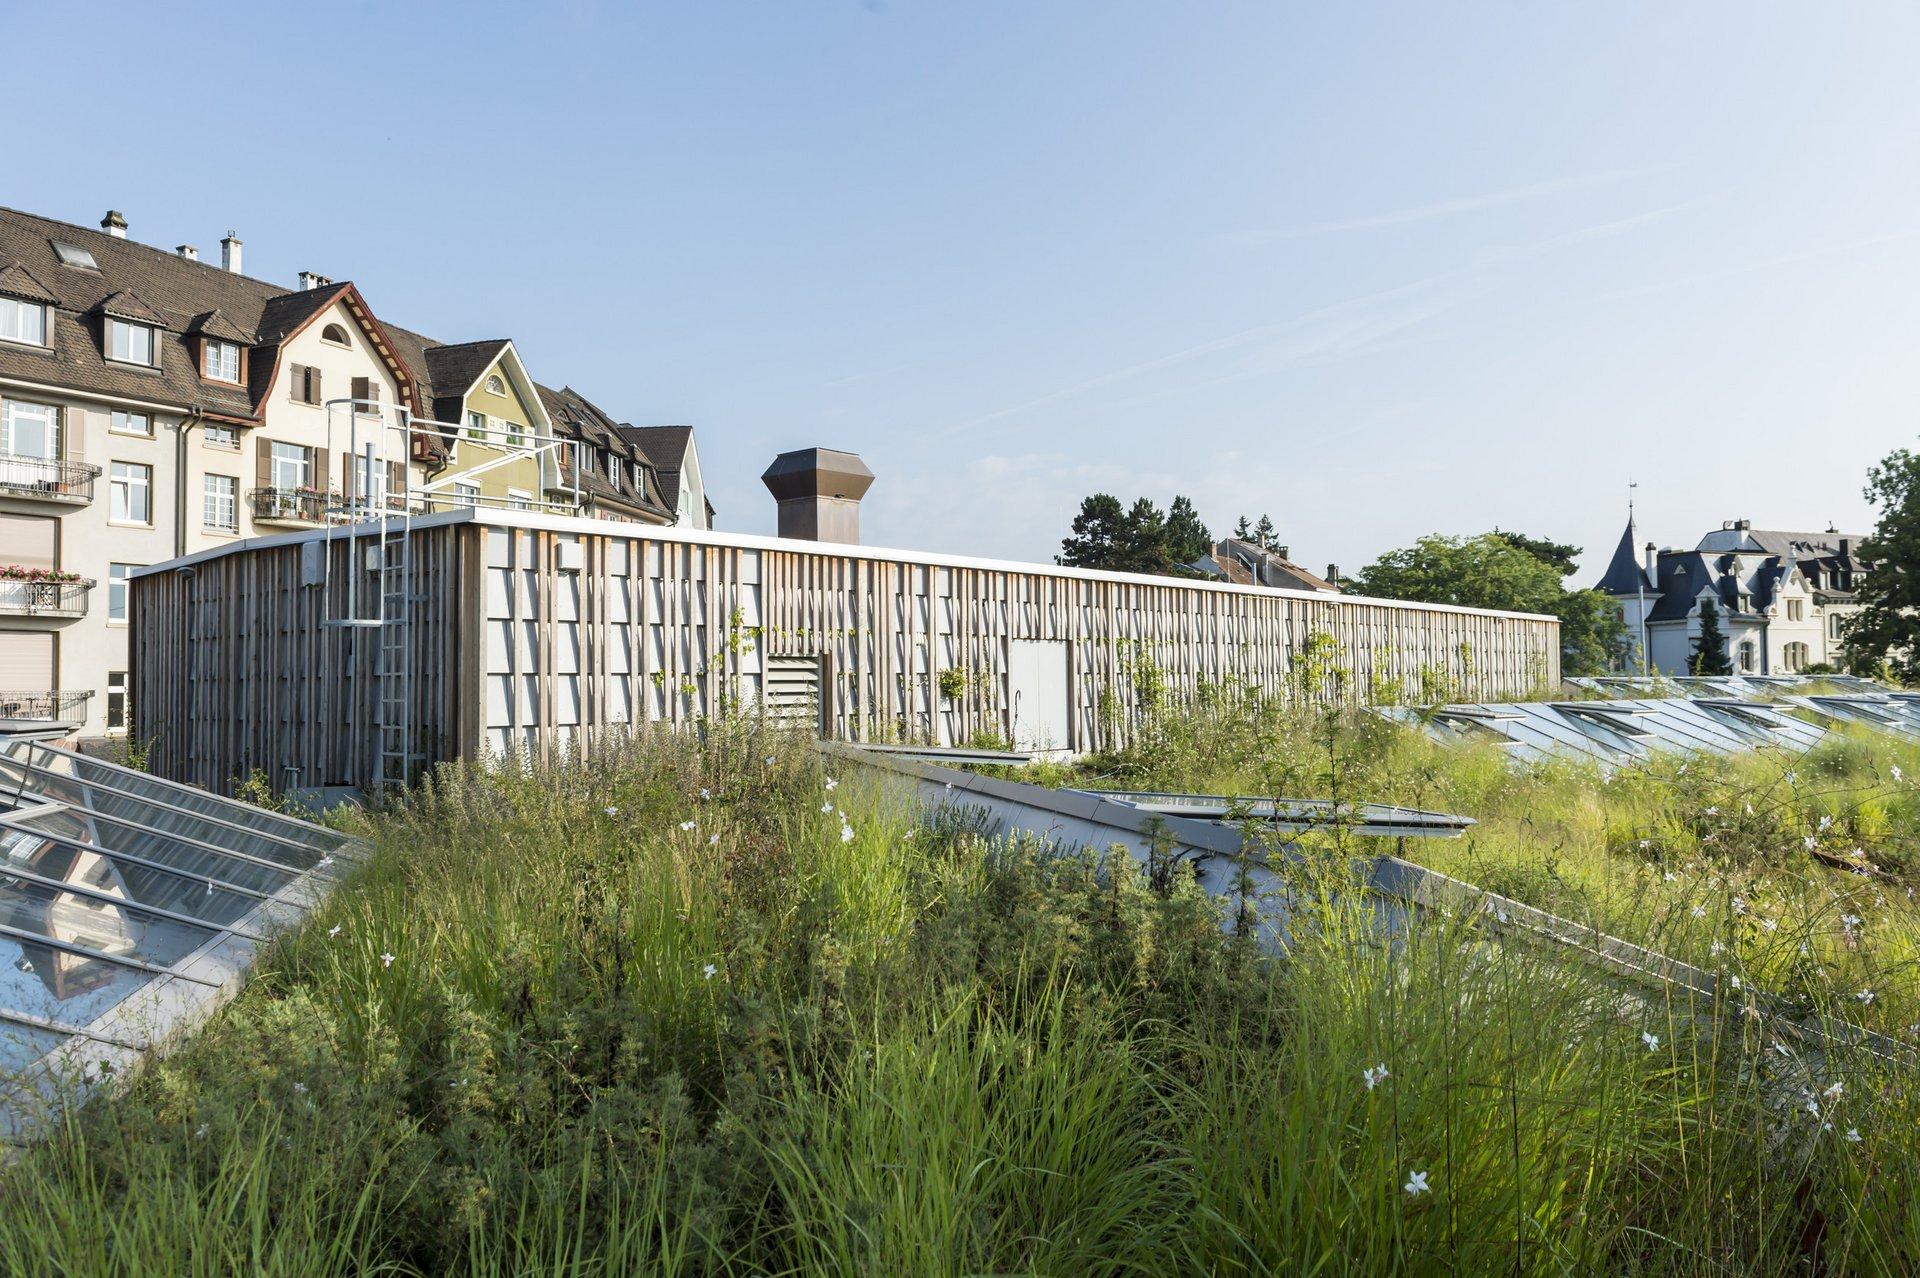 Elefantenhaus, Heulager, Holzkonstruktion, Material, Tierhäuser Stall, ZOO BASEL, Zoo Basel Gebäude